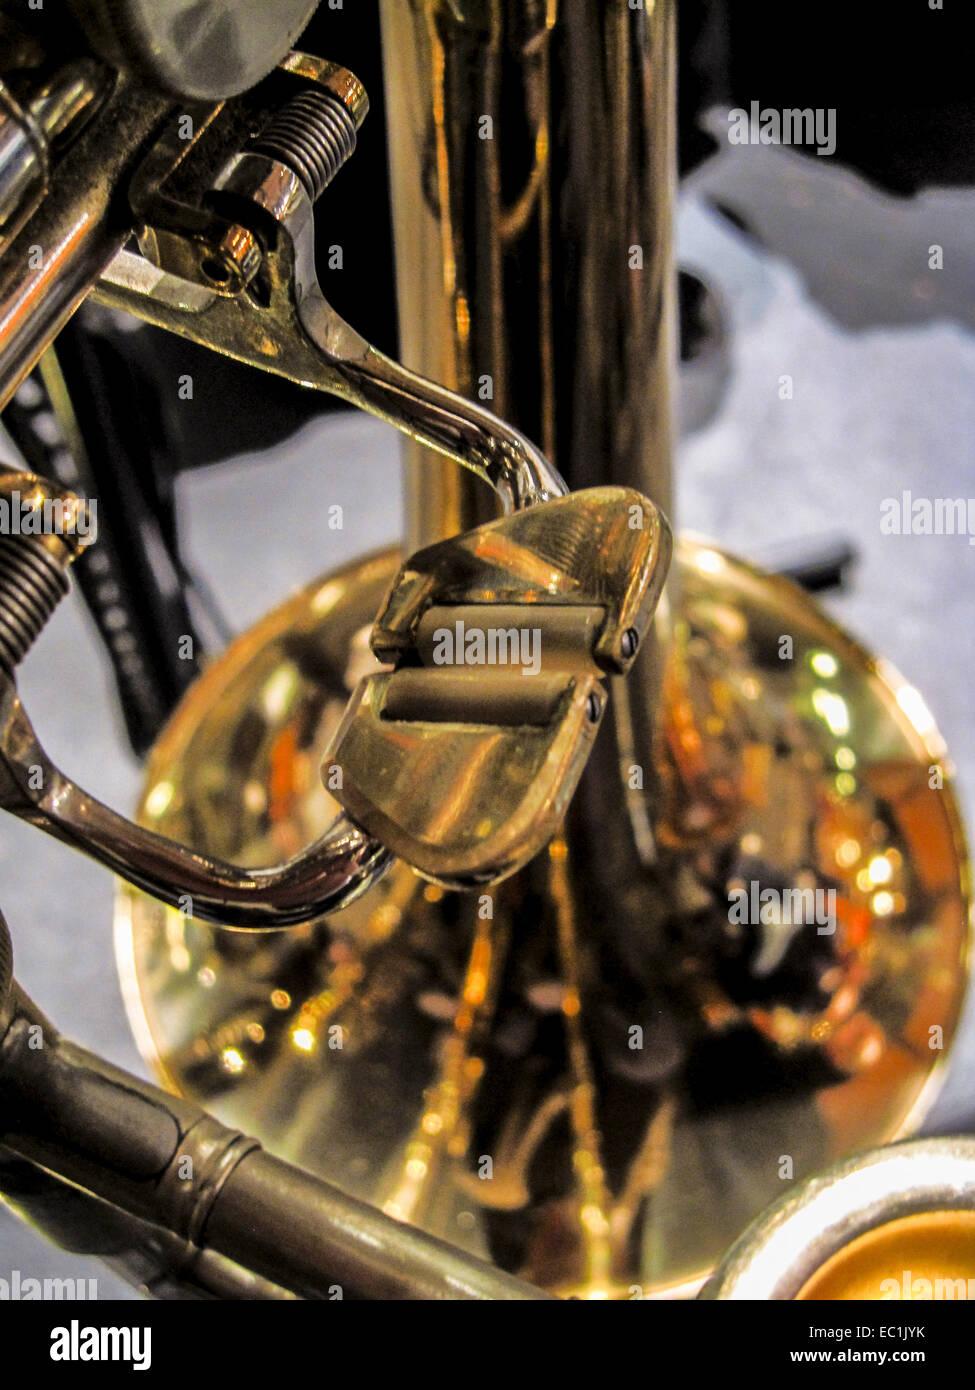 Trombone thumb trigger on rotary valve. Orchestral tenor trombone in Bb. A tenor trombone has either no valves or - Stock Image